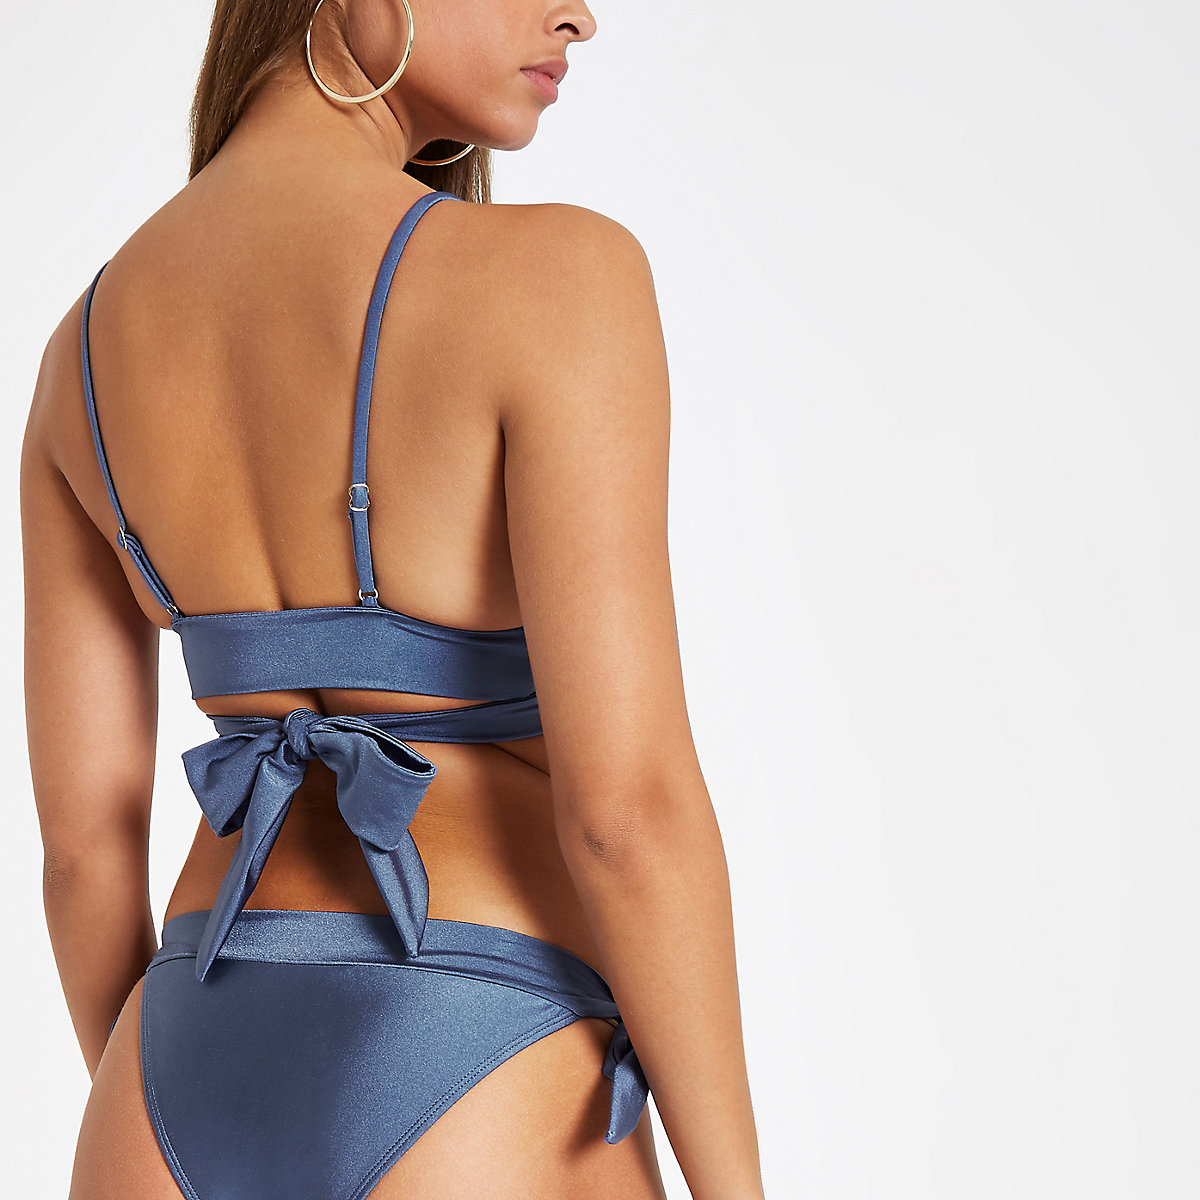 1c2c90537acc8 Blue shirred tie front triangle bikini top - Bikini Tops - Bikinis ...